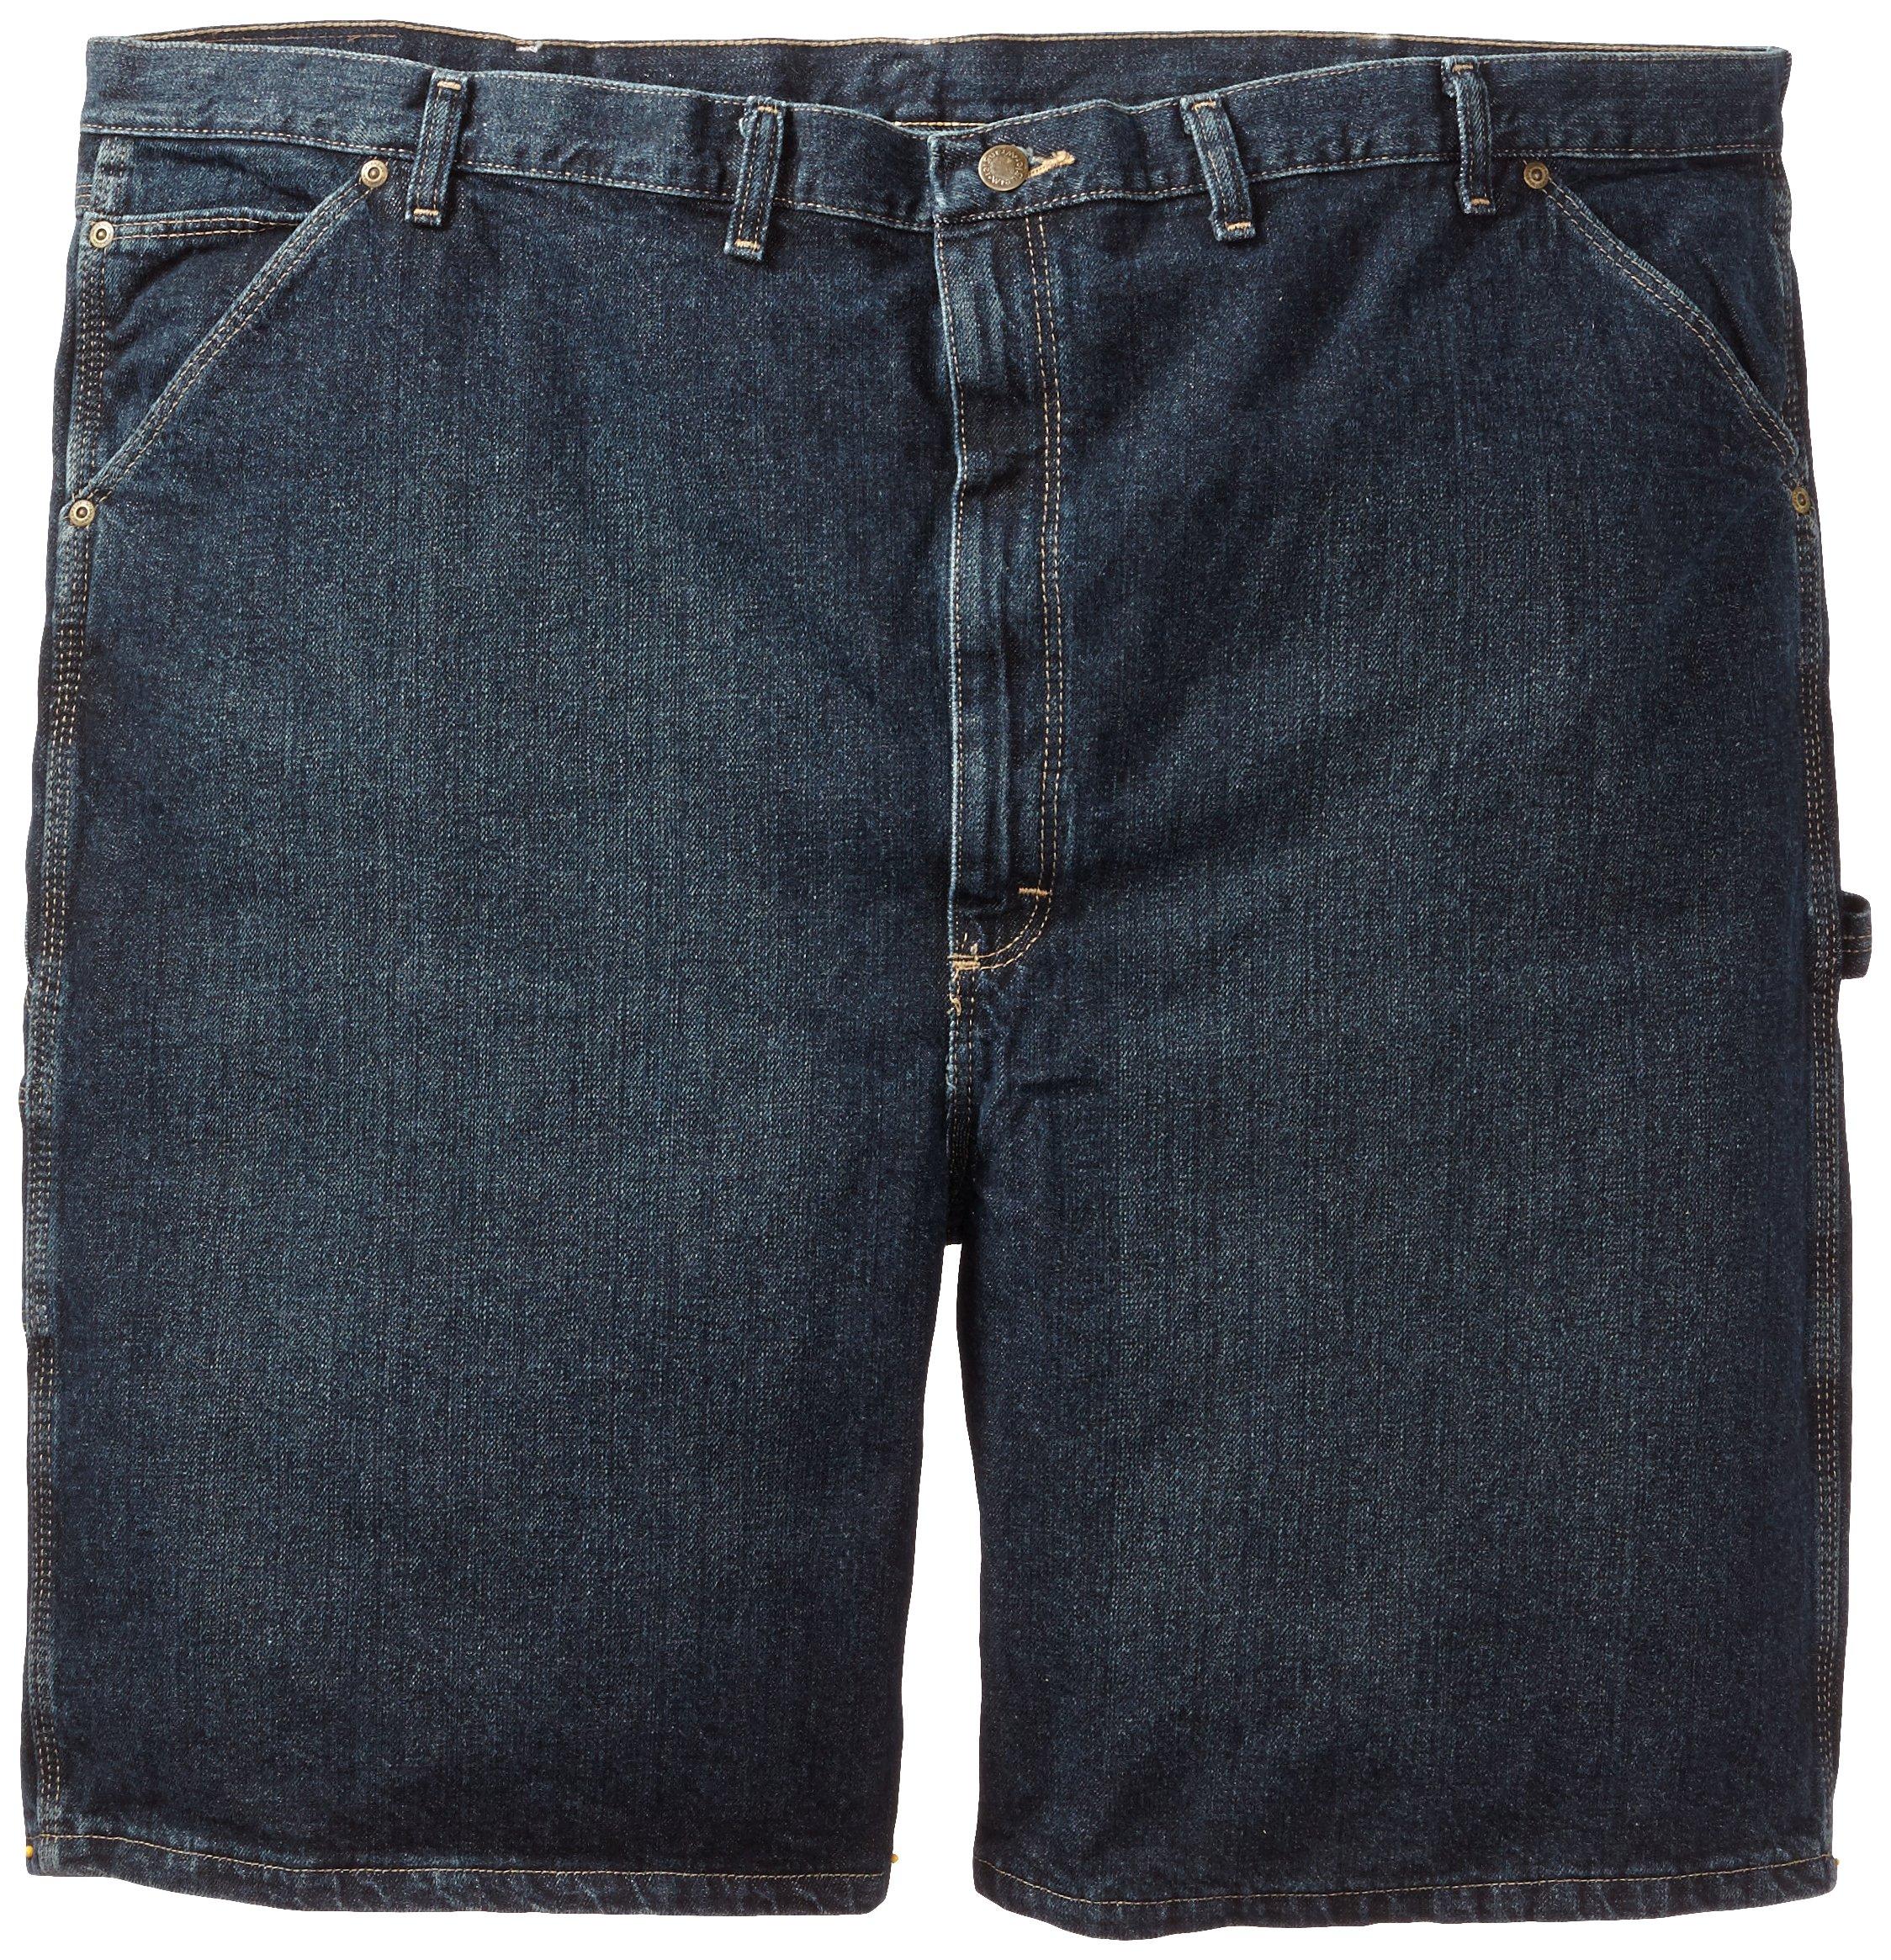 Wrangler Men's Extra Big Rugged Wear Carpenter Short Dark Quartz,46